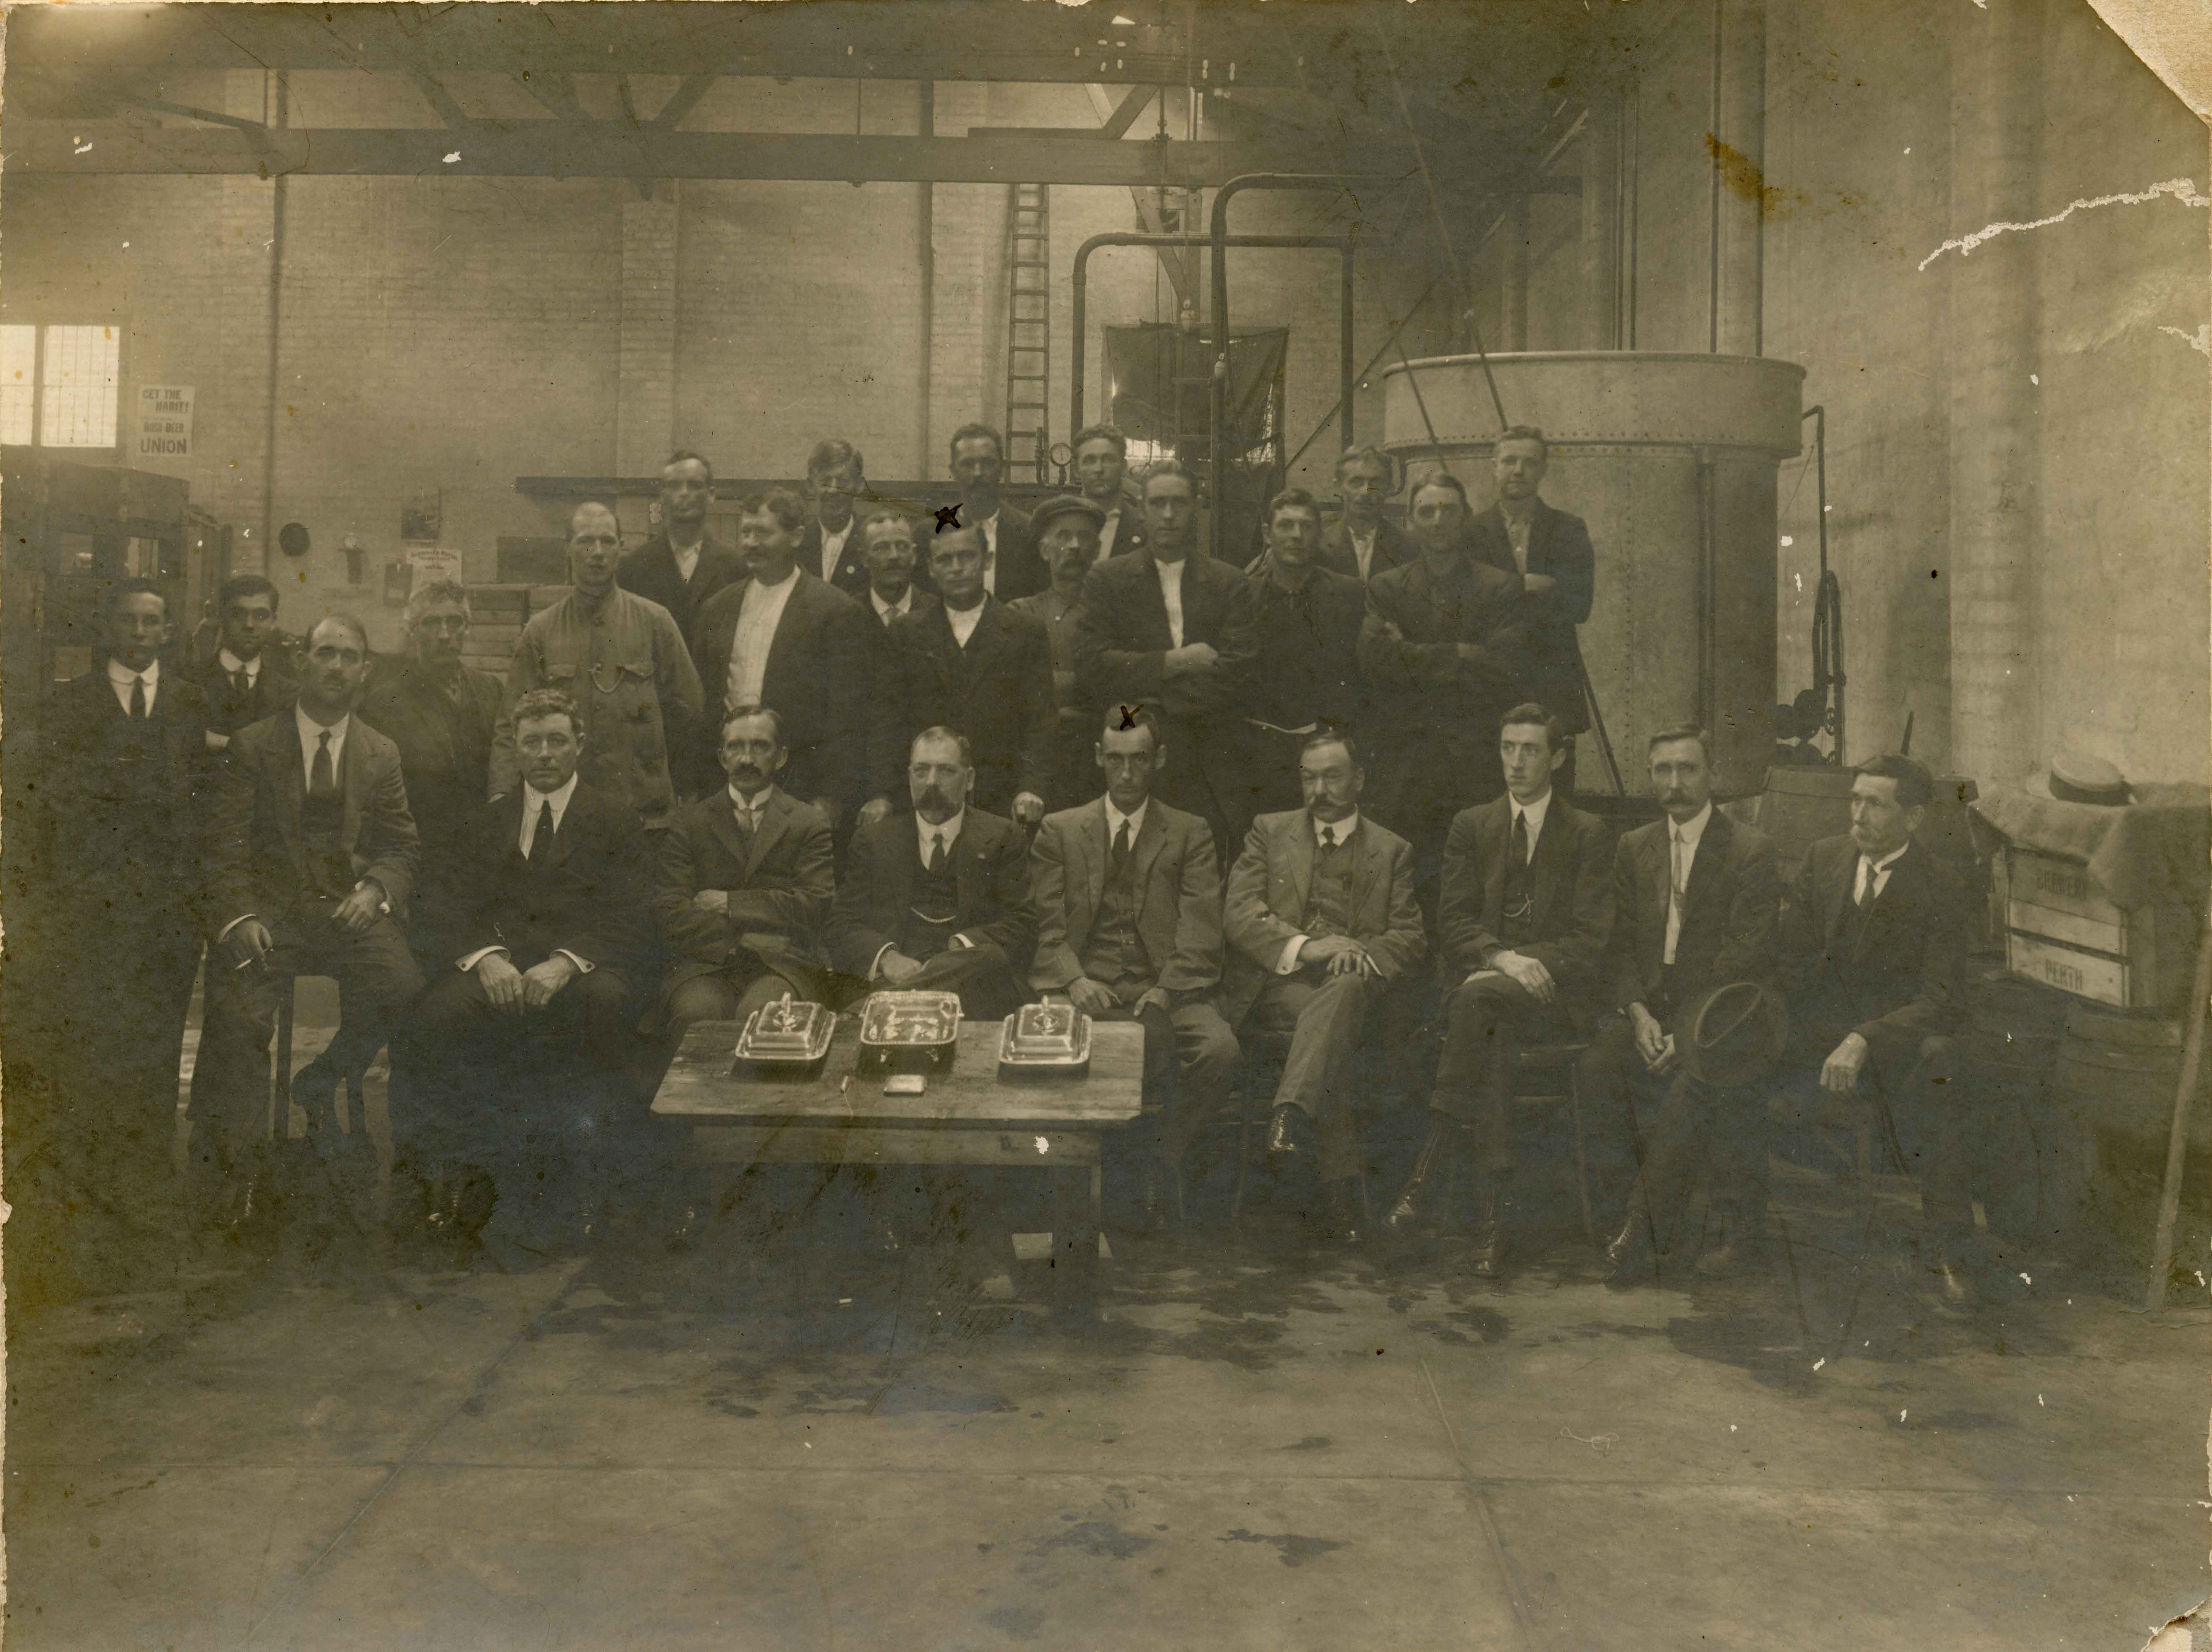 74. Union Brewery Perth, 1917